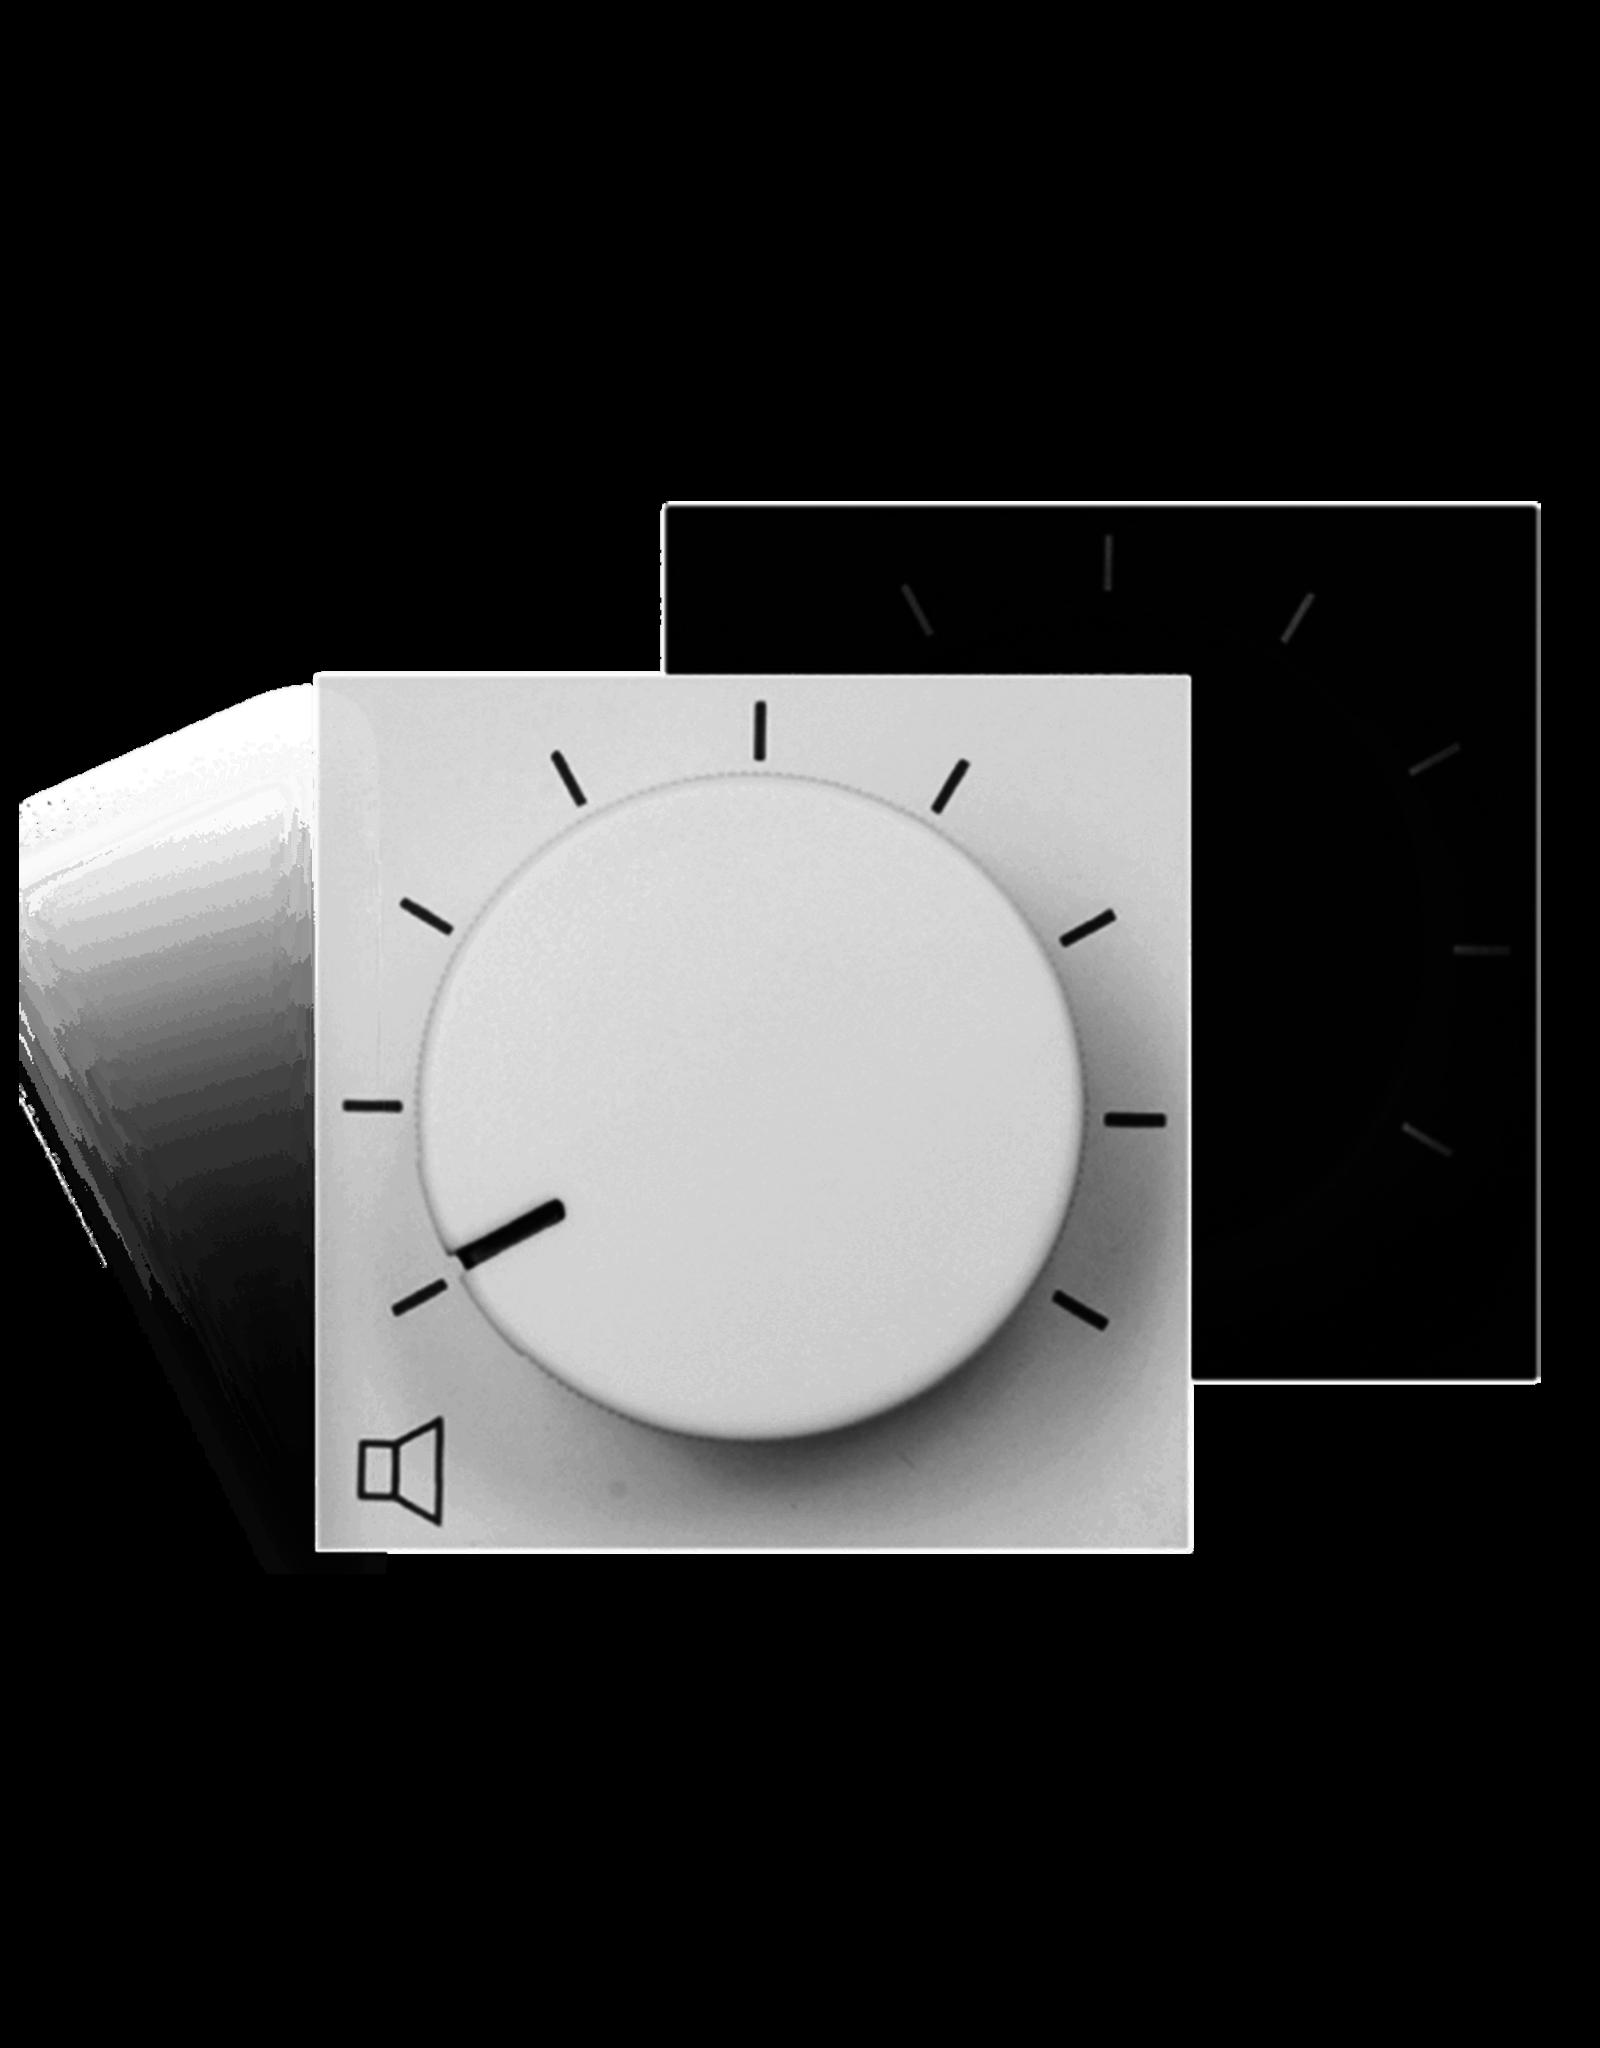 Audac Remote volume controller 45 x 45 mm White version